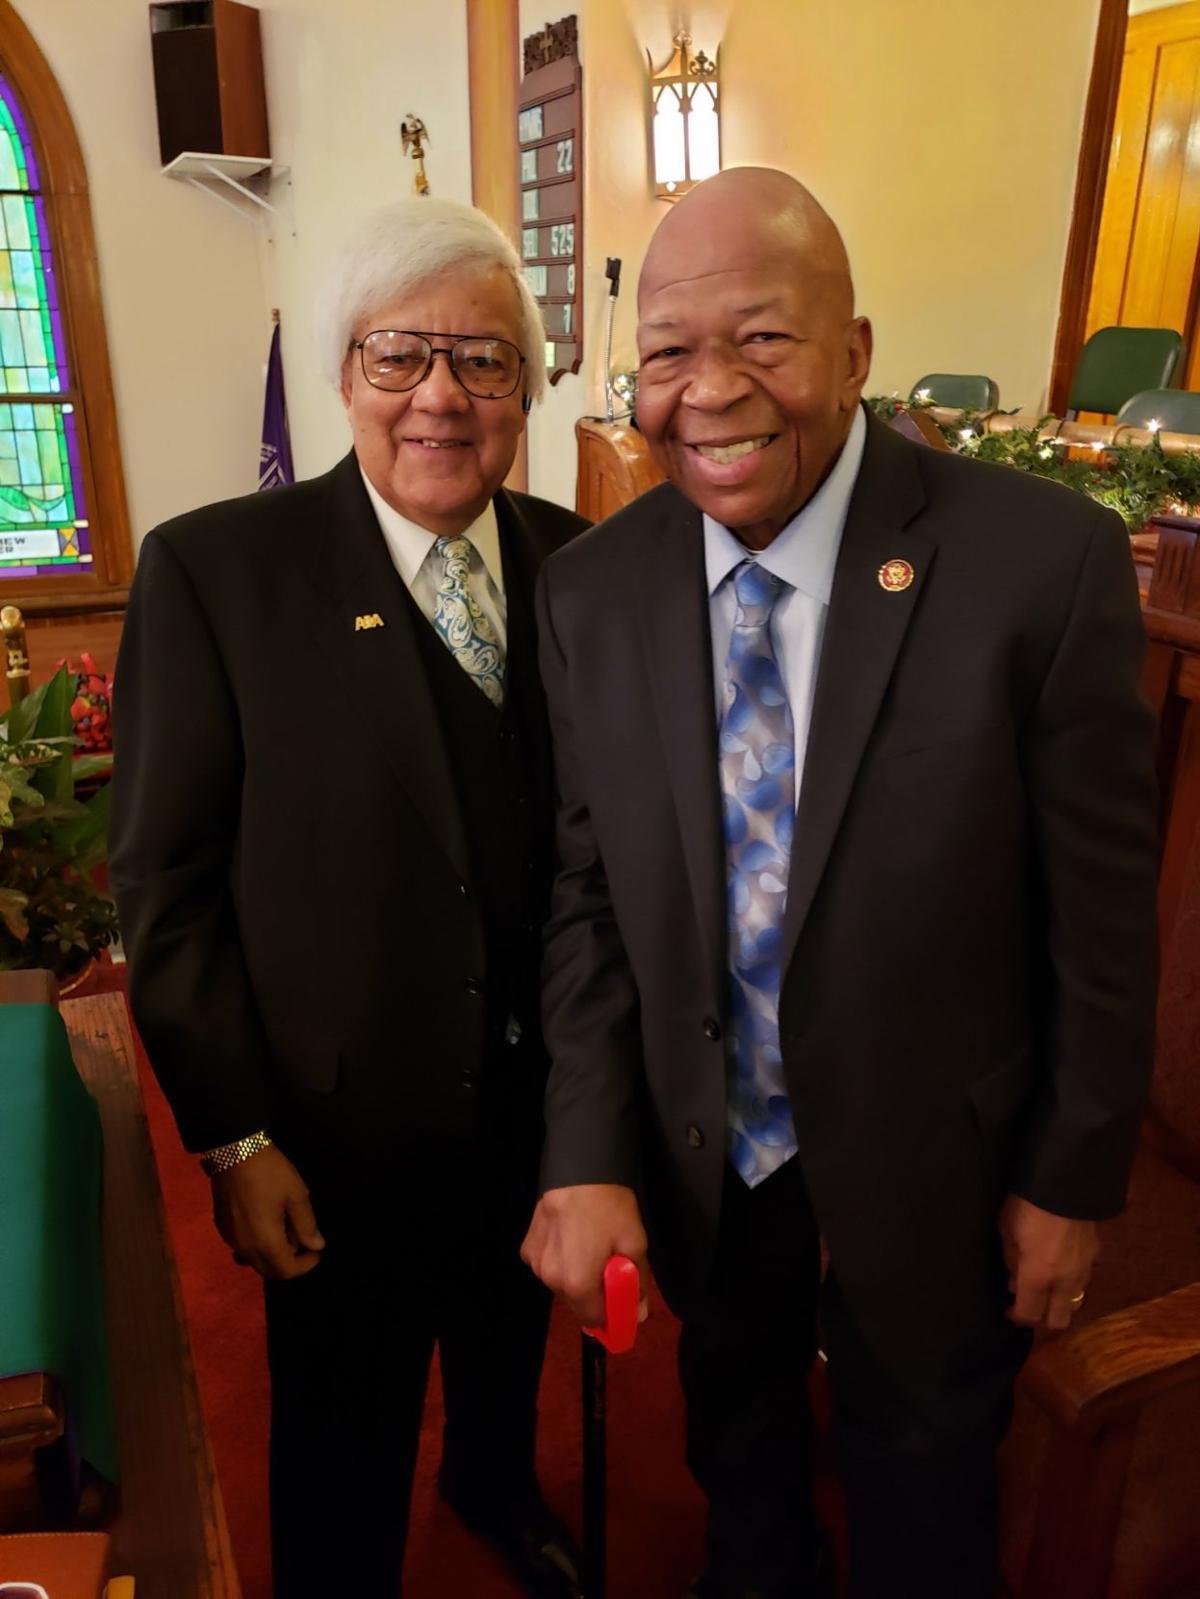 Congressman Cummings stresses education for all